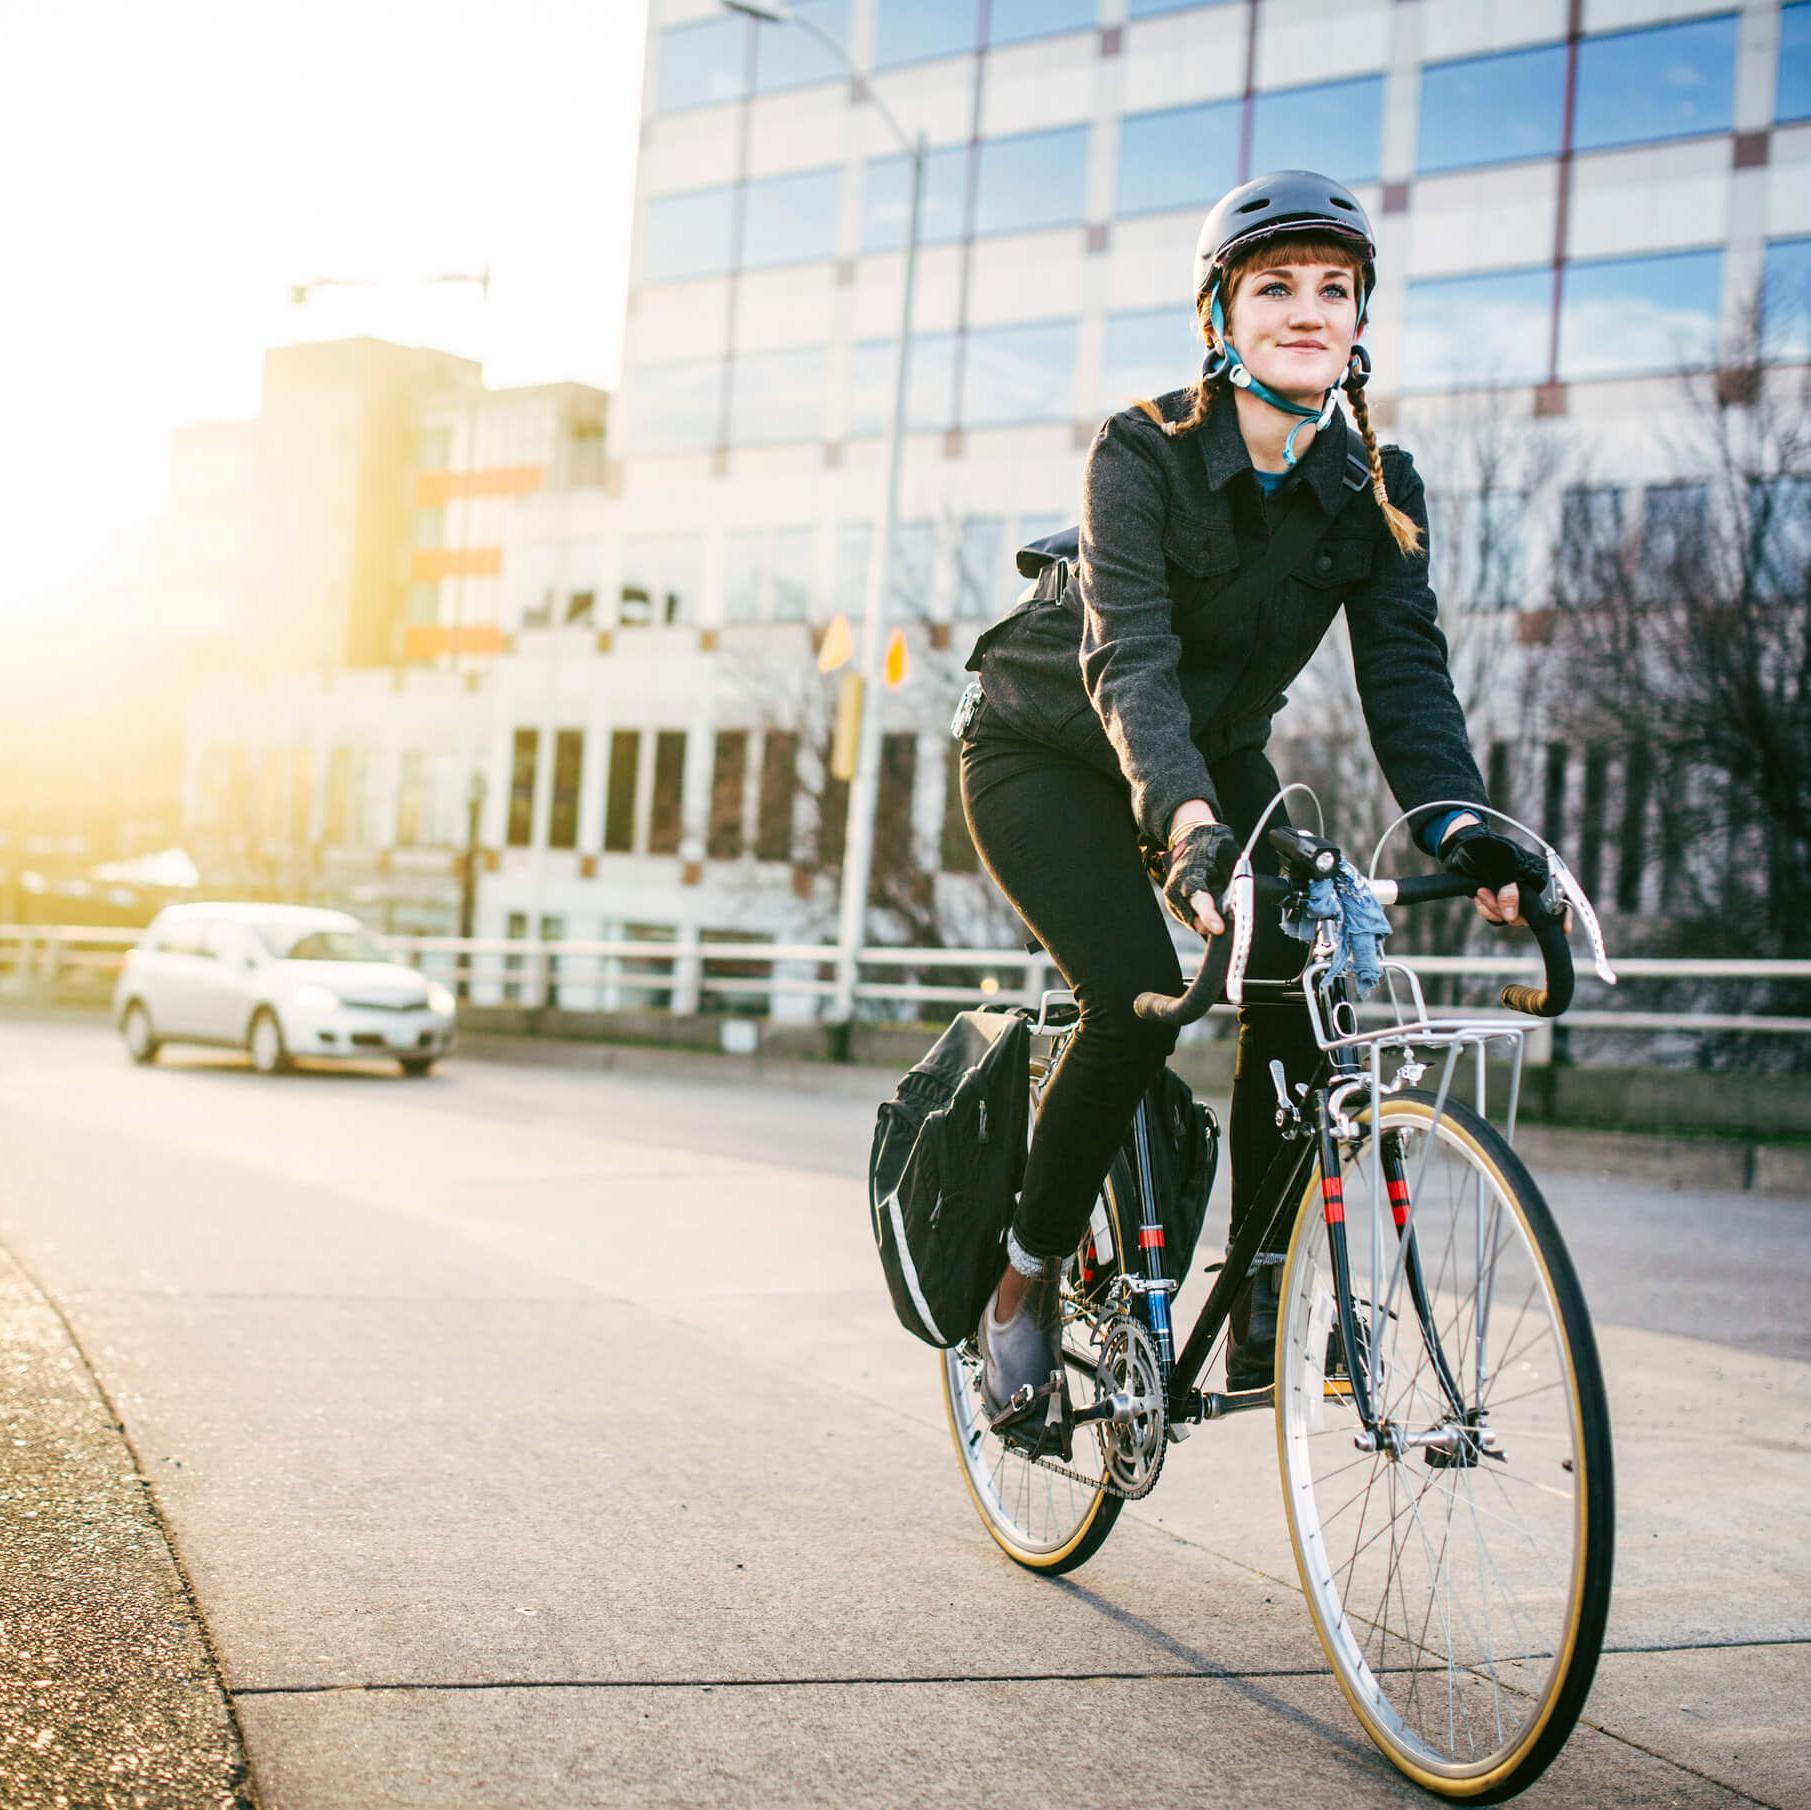 Cycliste urbain : conseils de sécurité